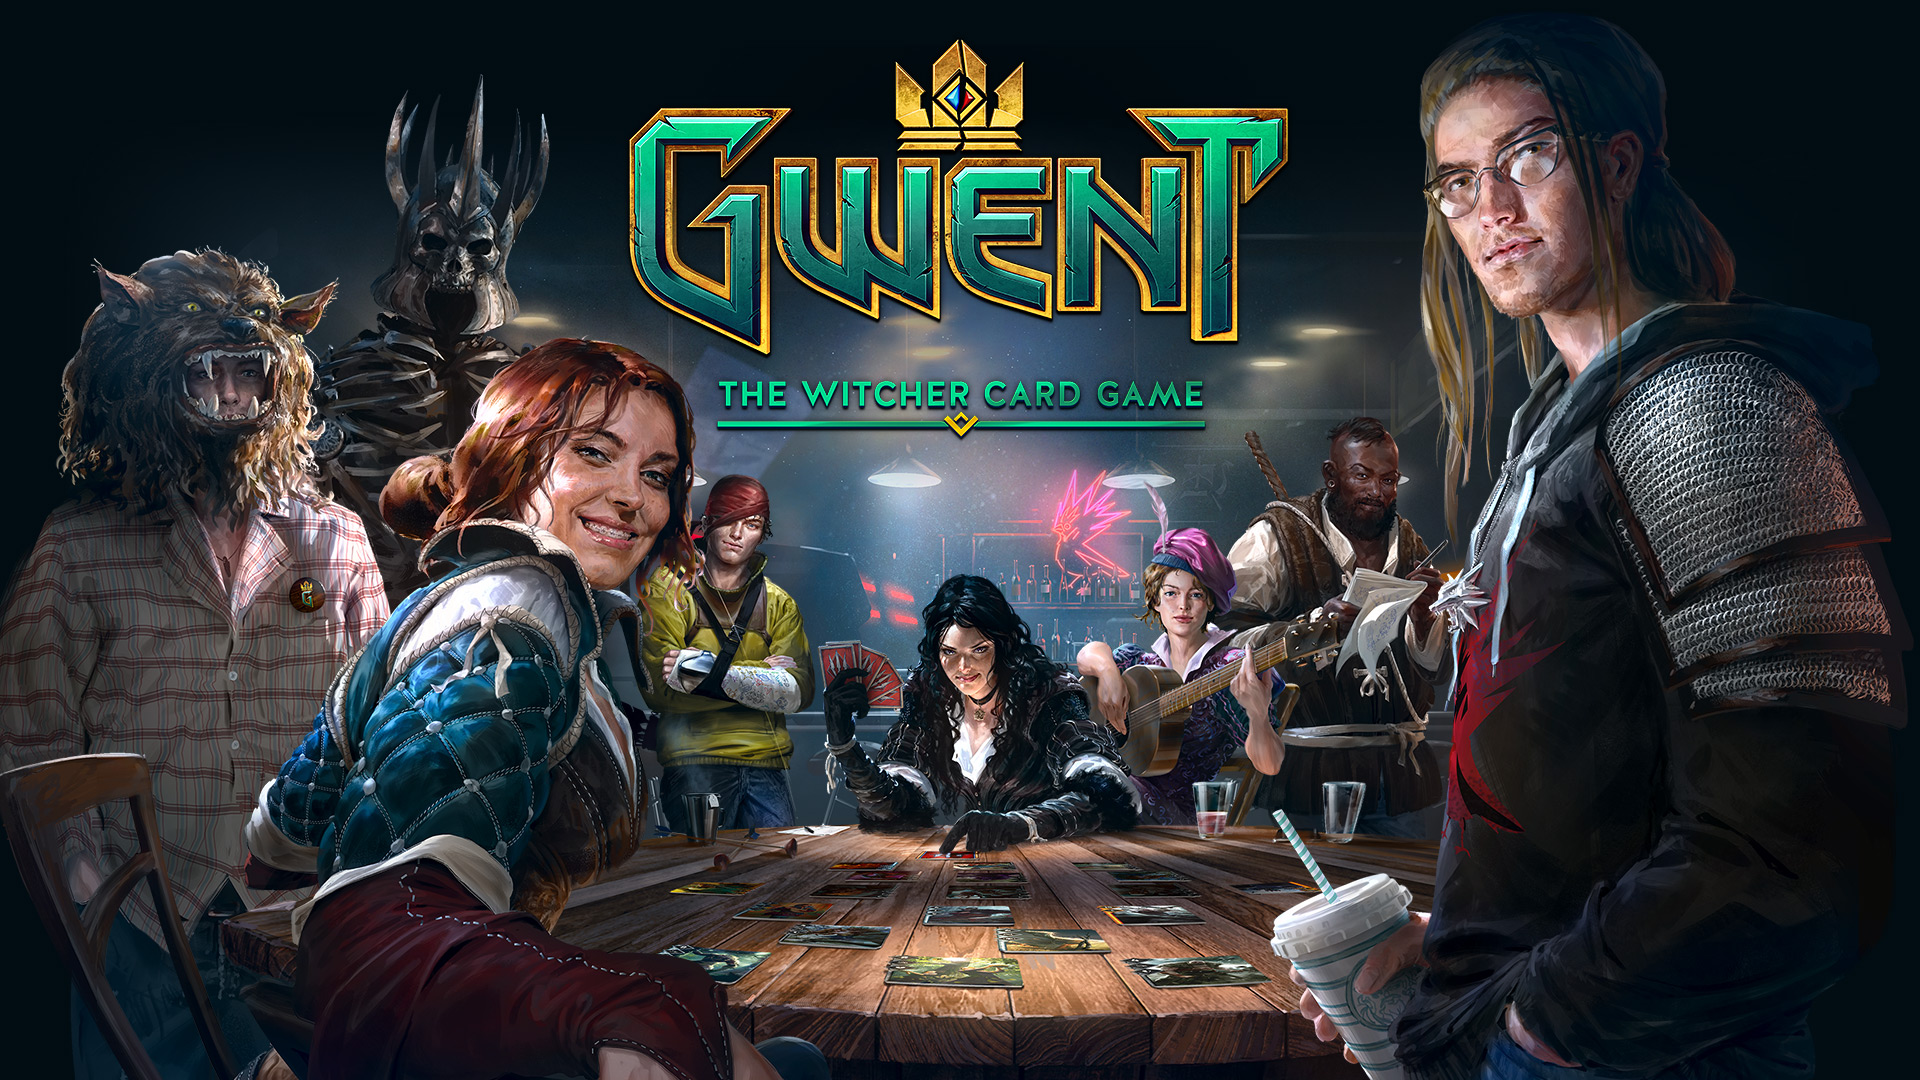 games gambling 2016 card rover